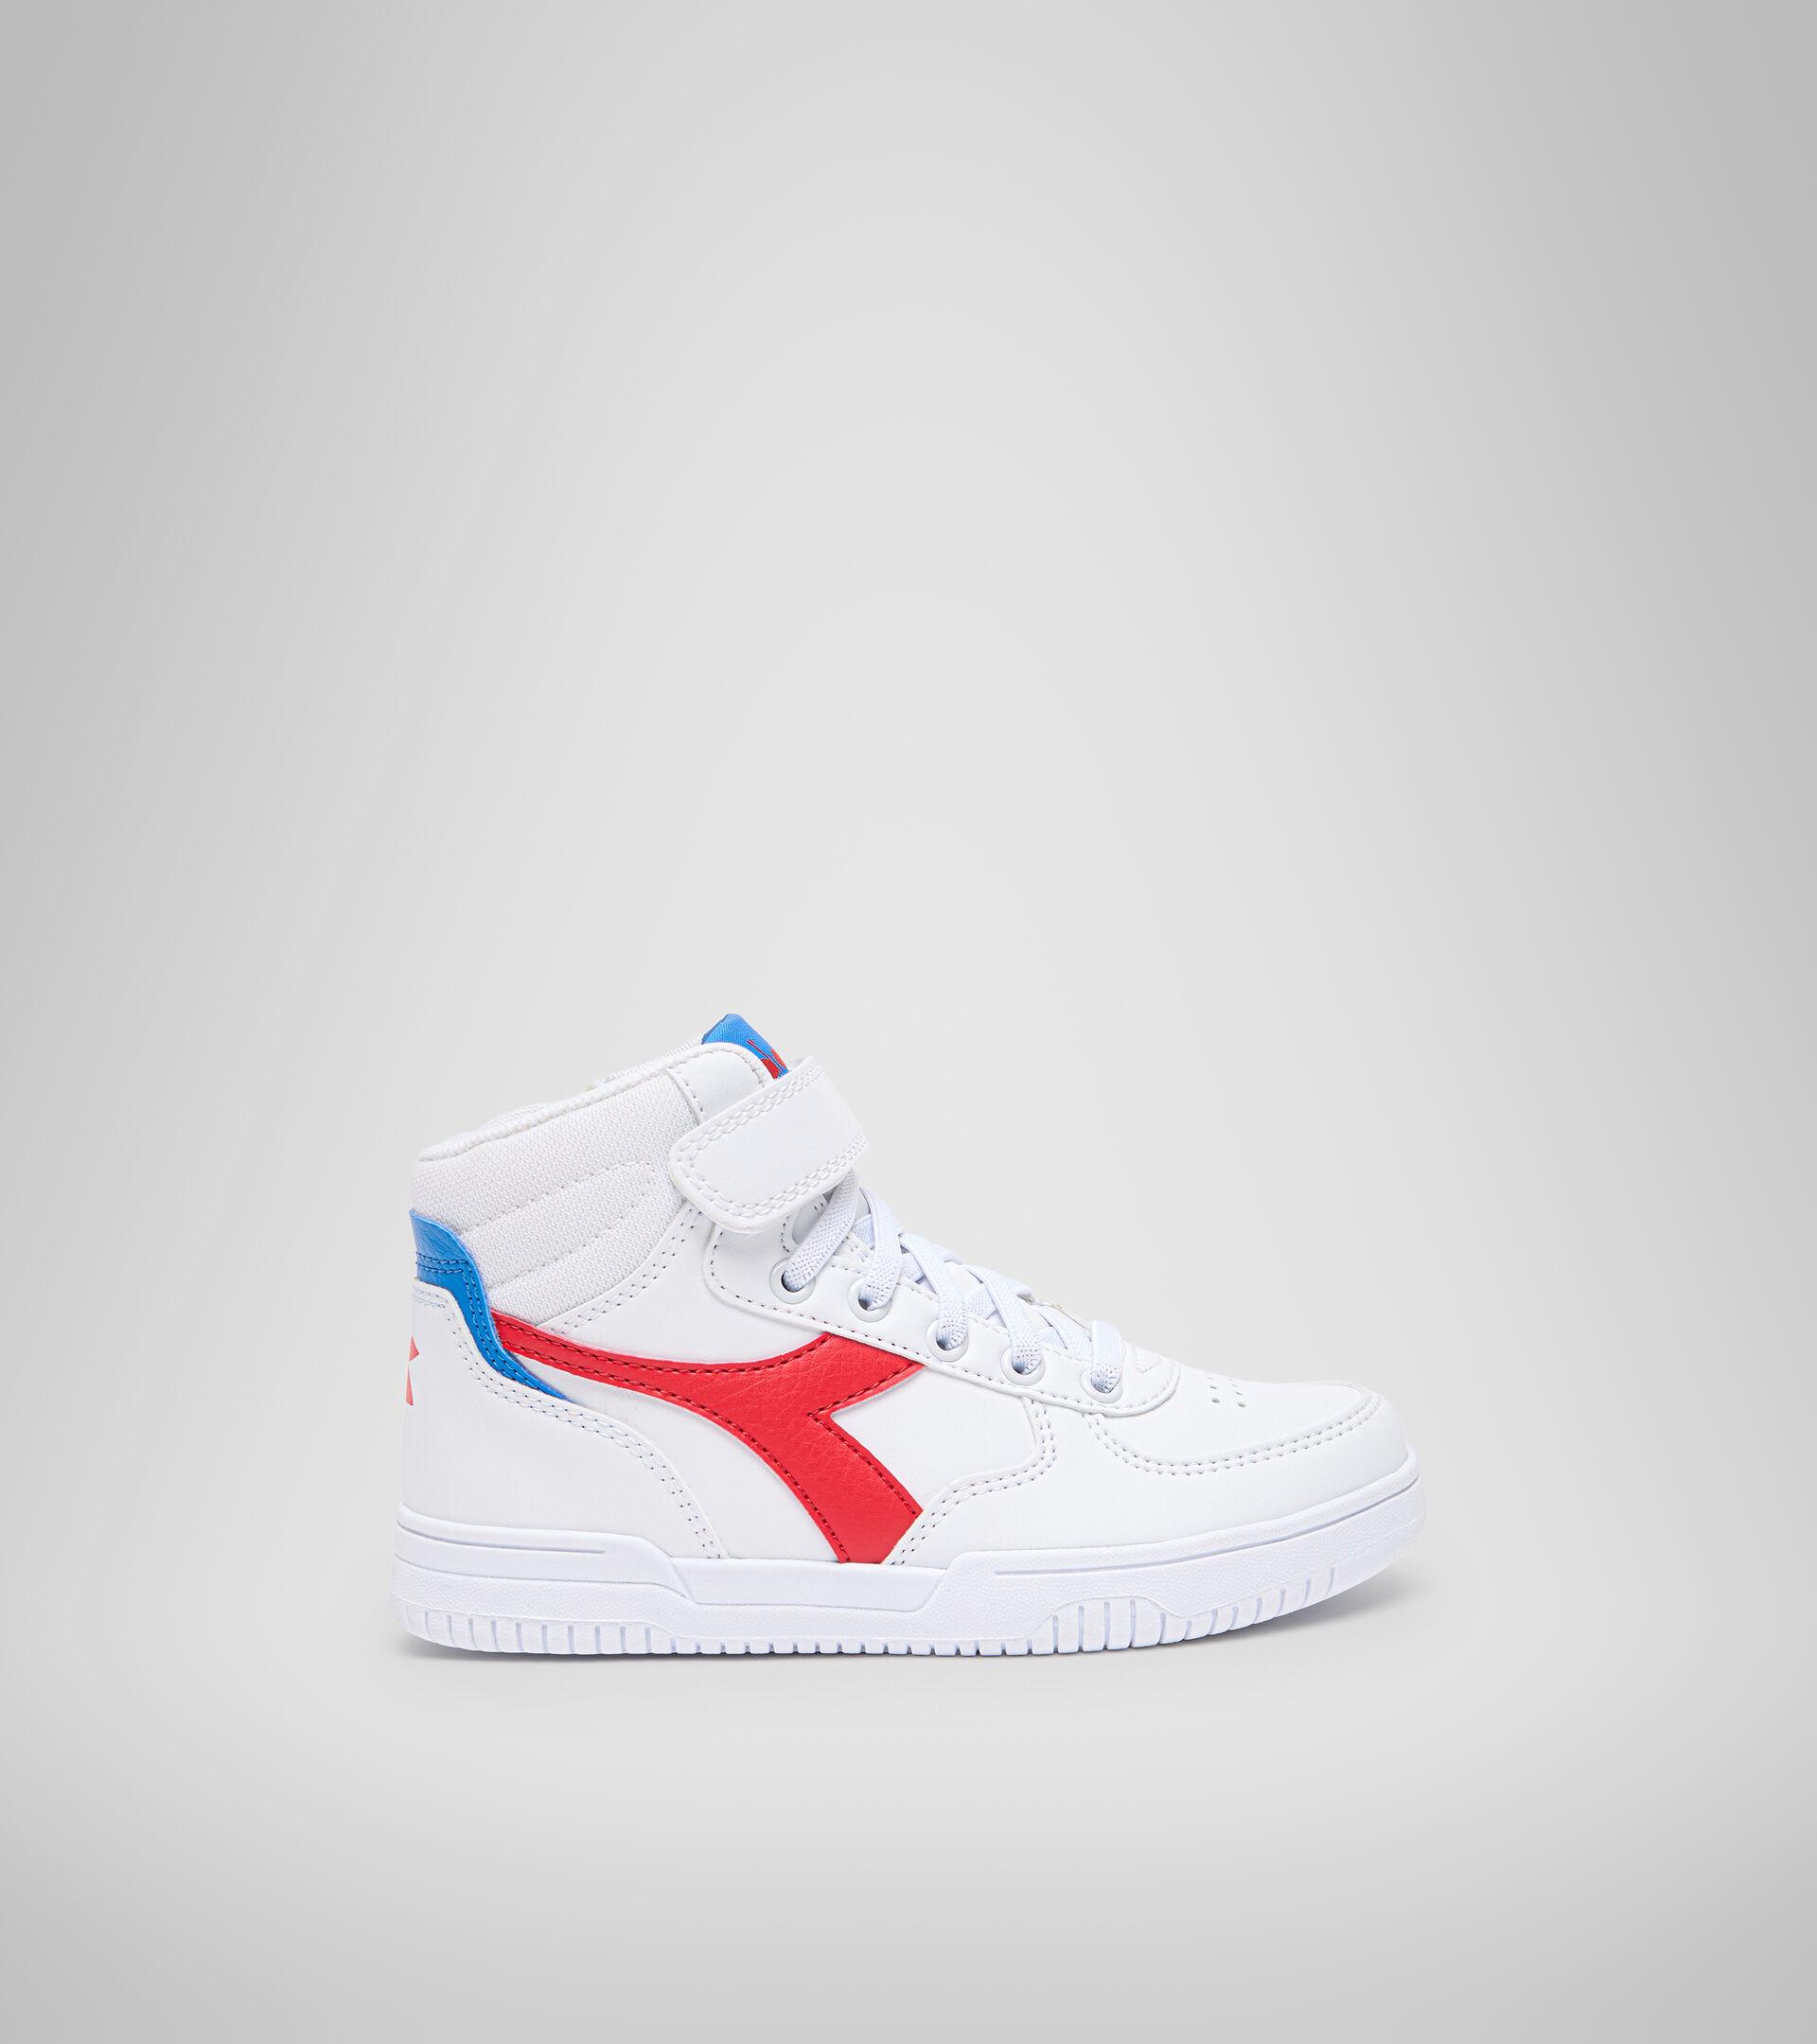 Chaussures de sport - Enfants 4-8 ans RAPTOR MID PS BIANCO/TOMATO RED - Diadora